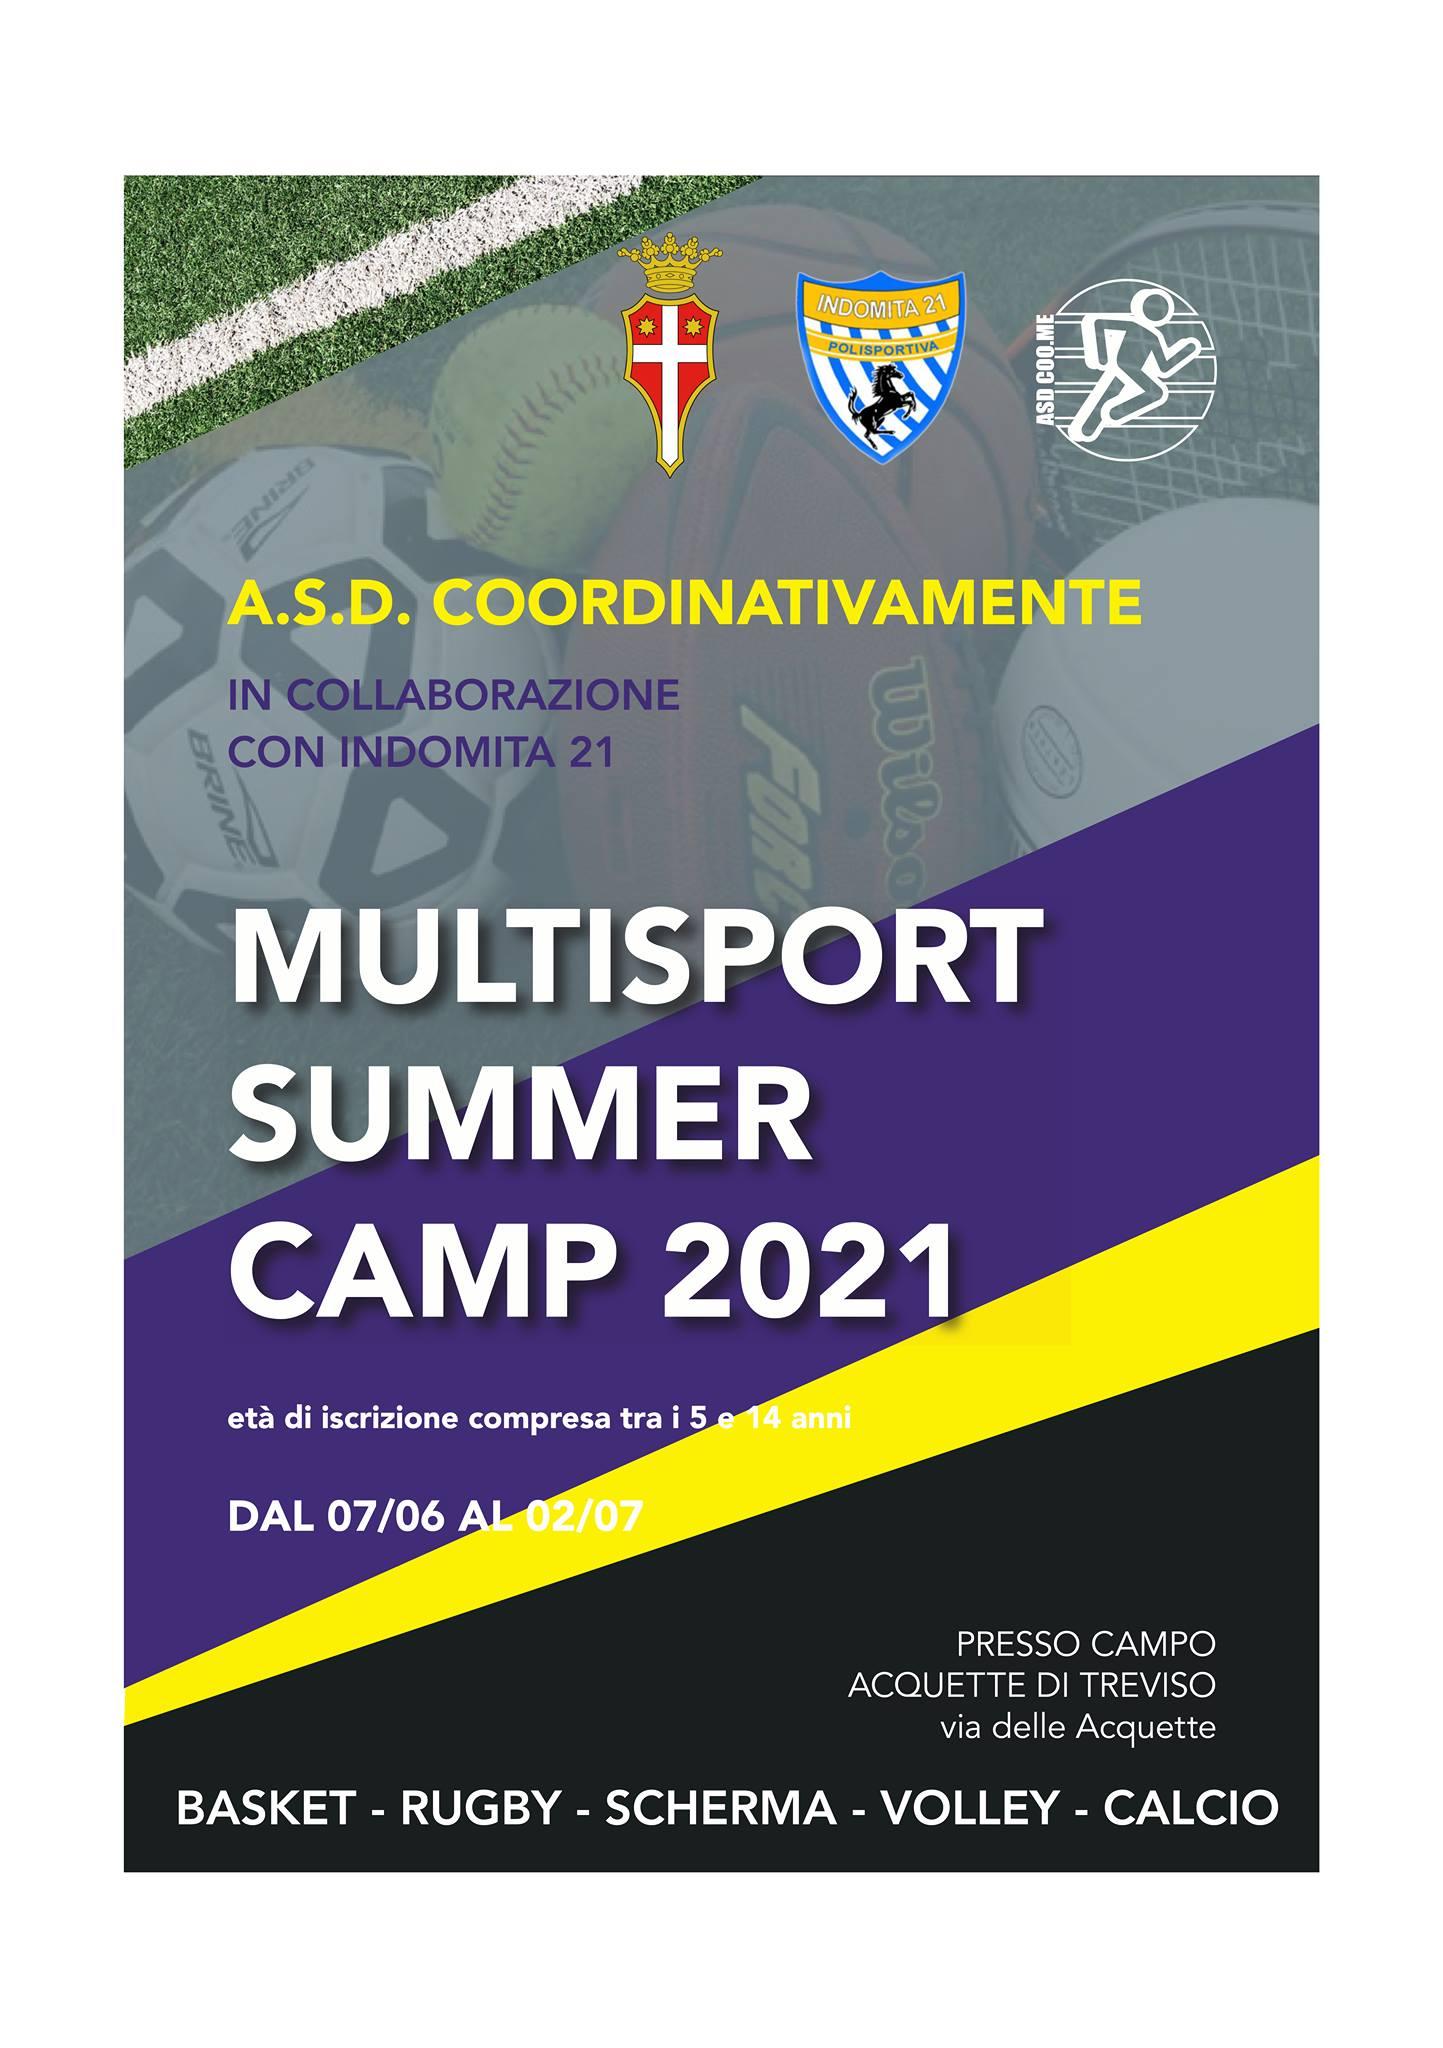 Treviso campo 2021 3